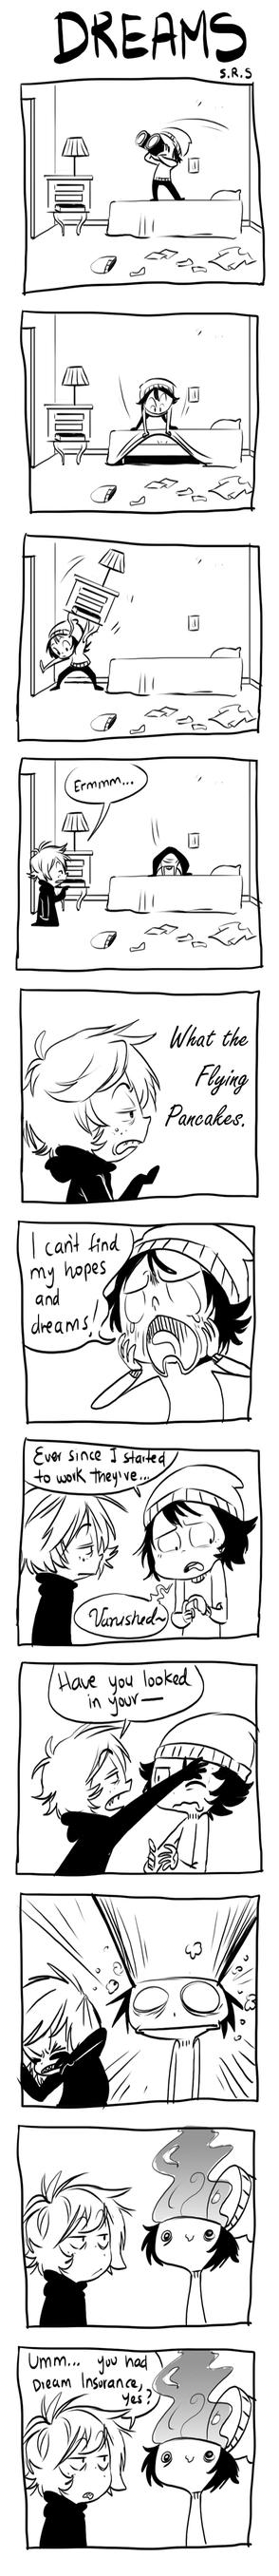 SRS: Dreams by Leaglem